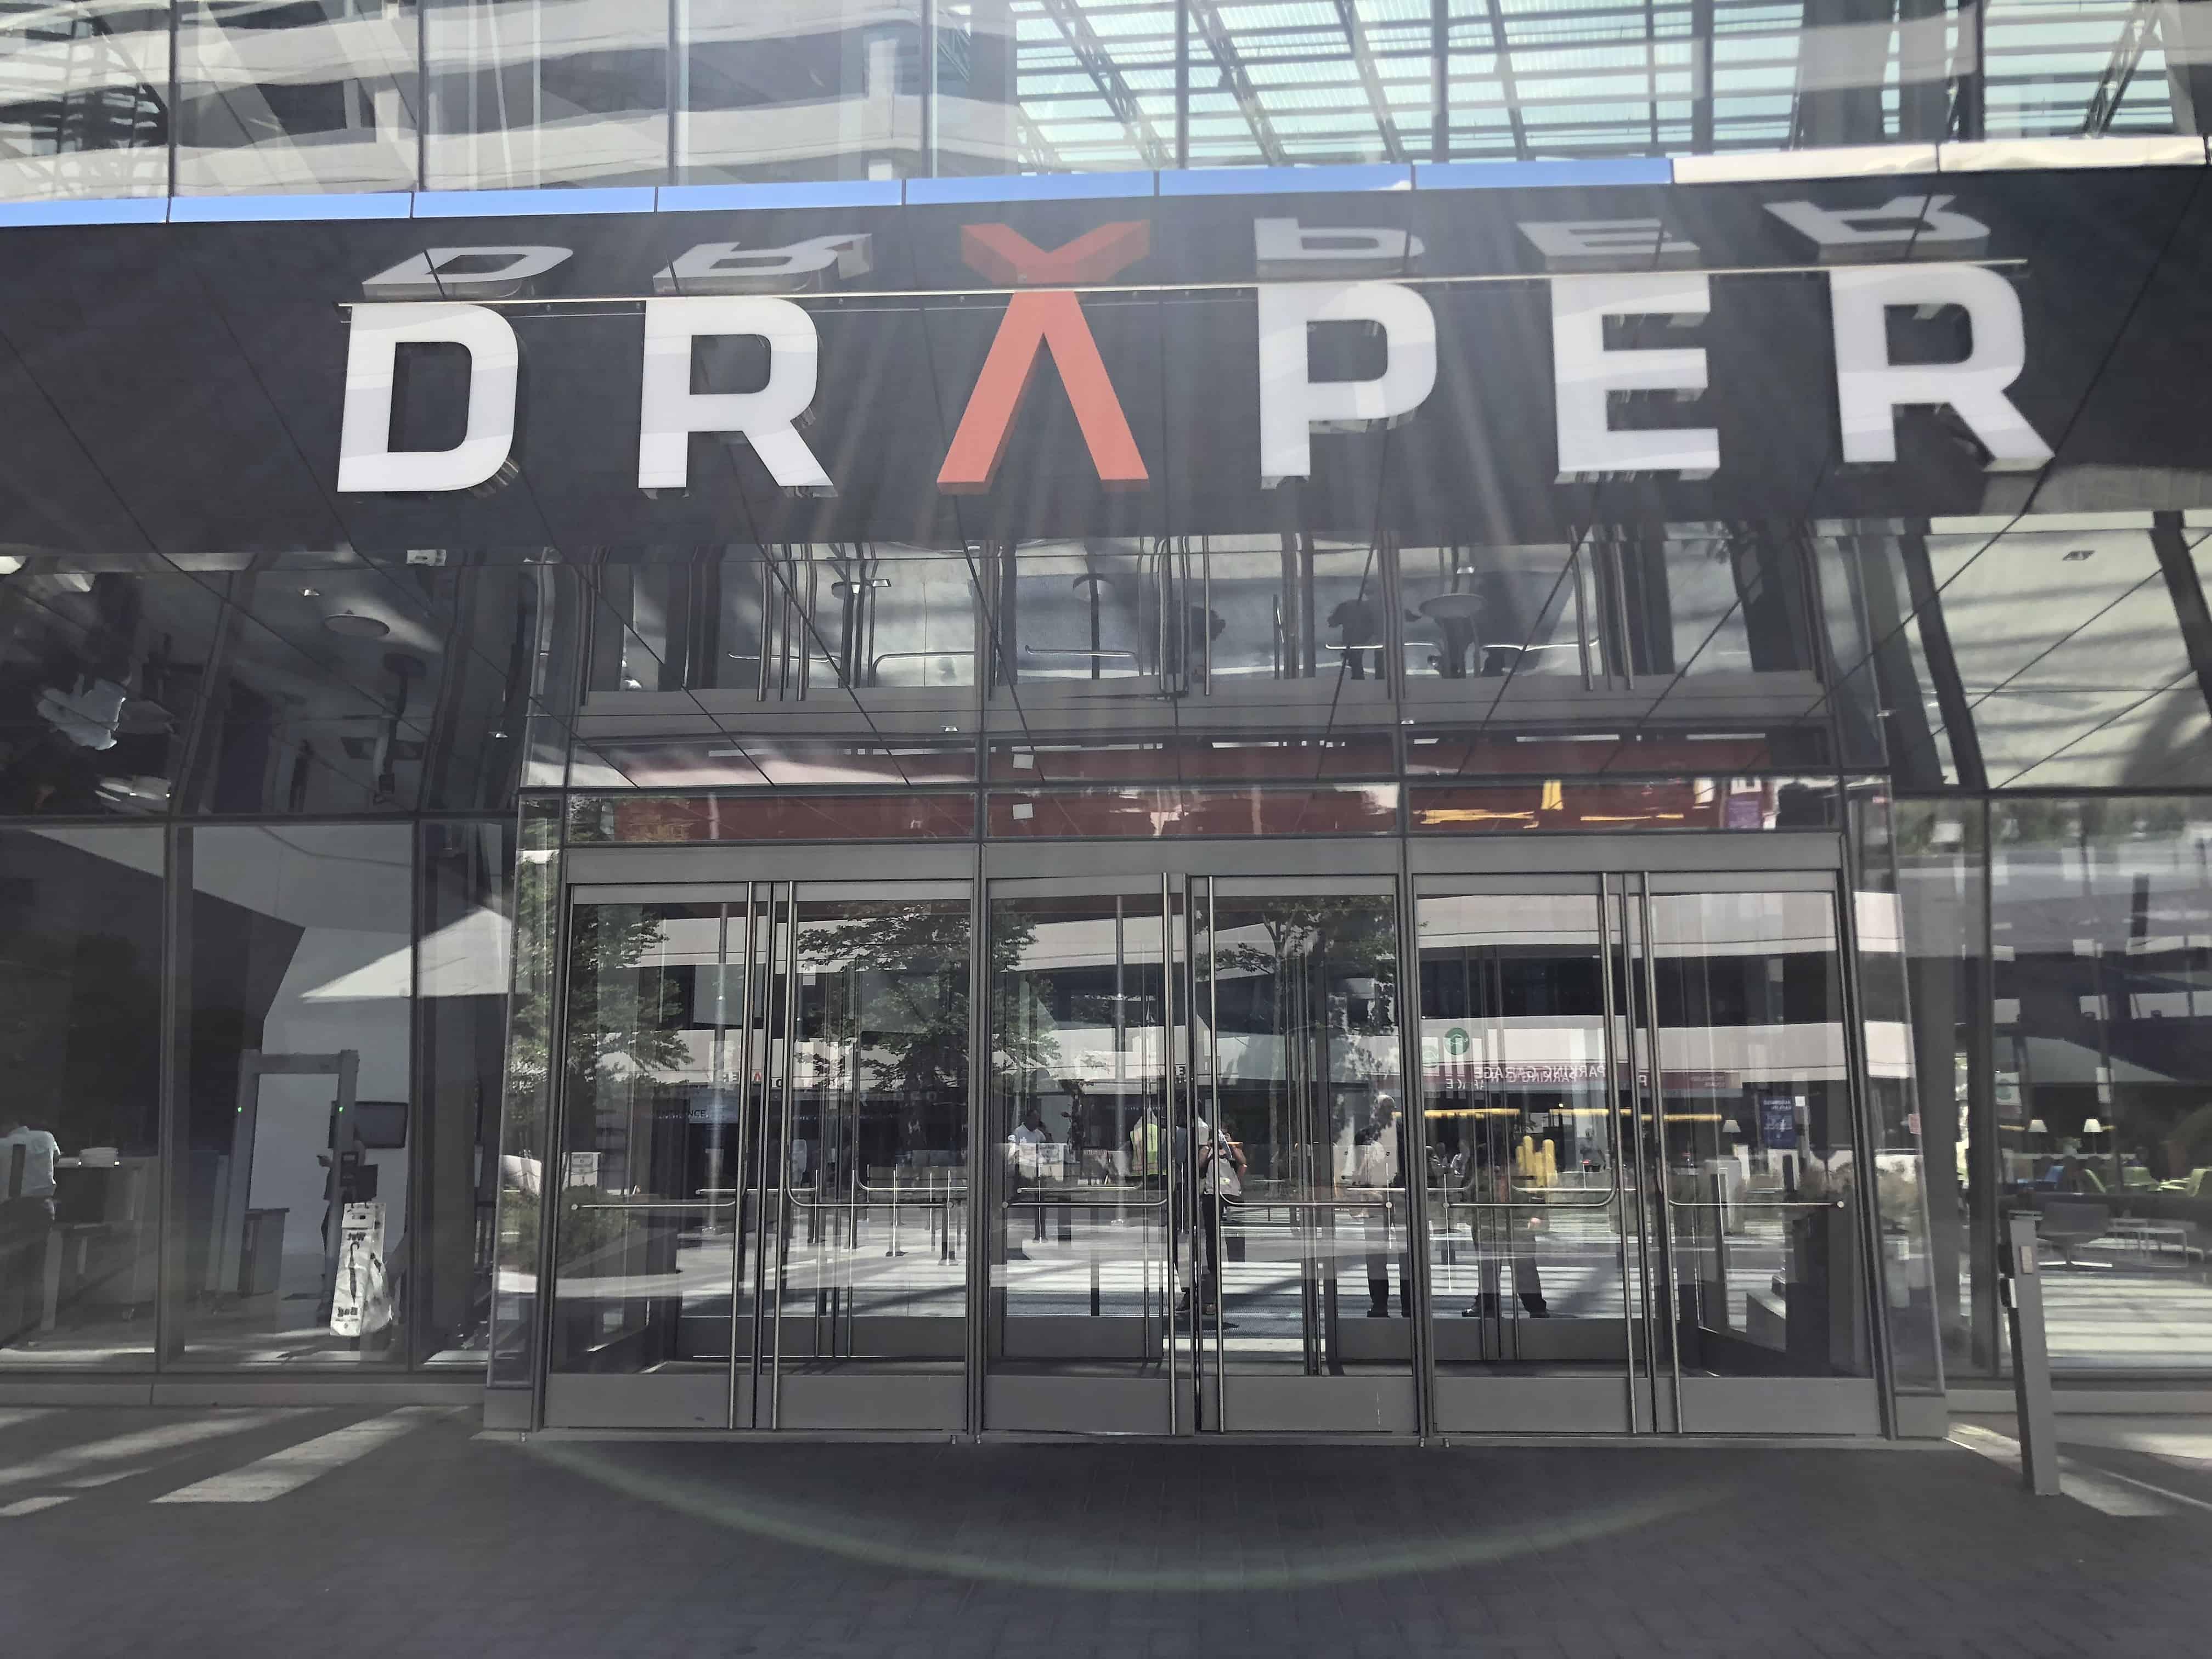 Draper 8